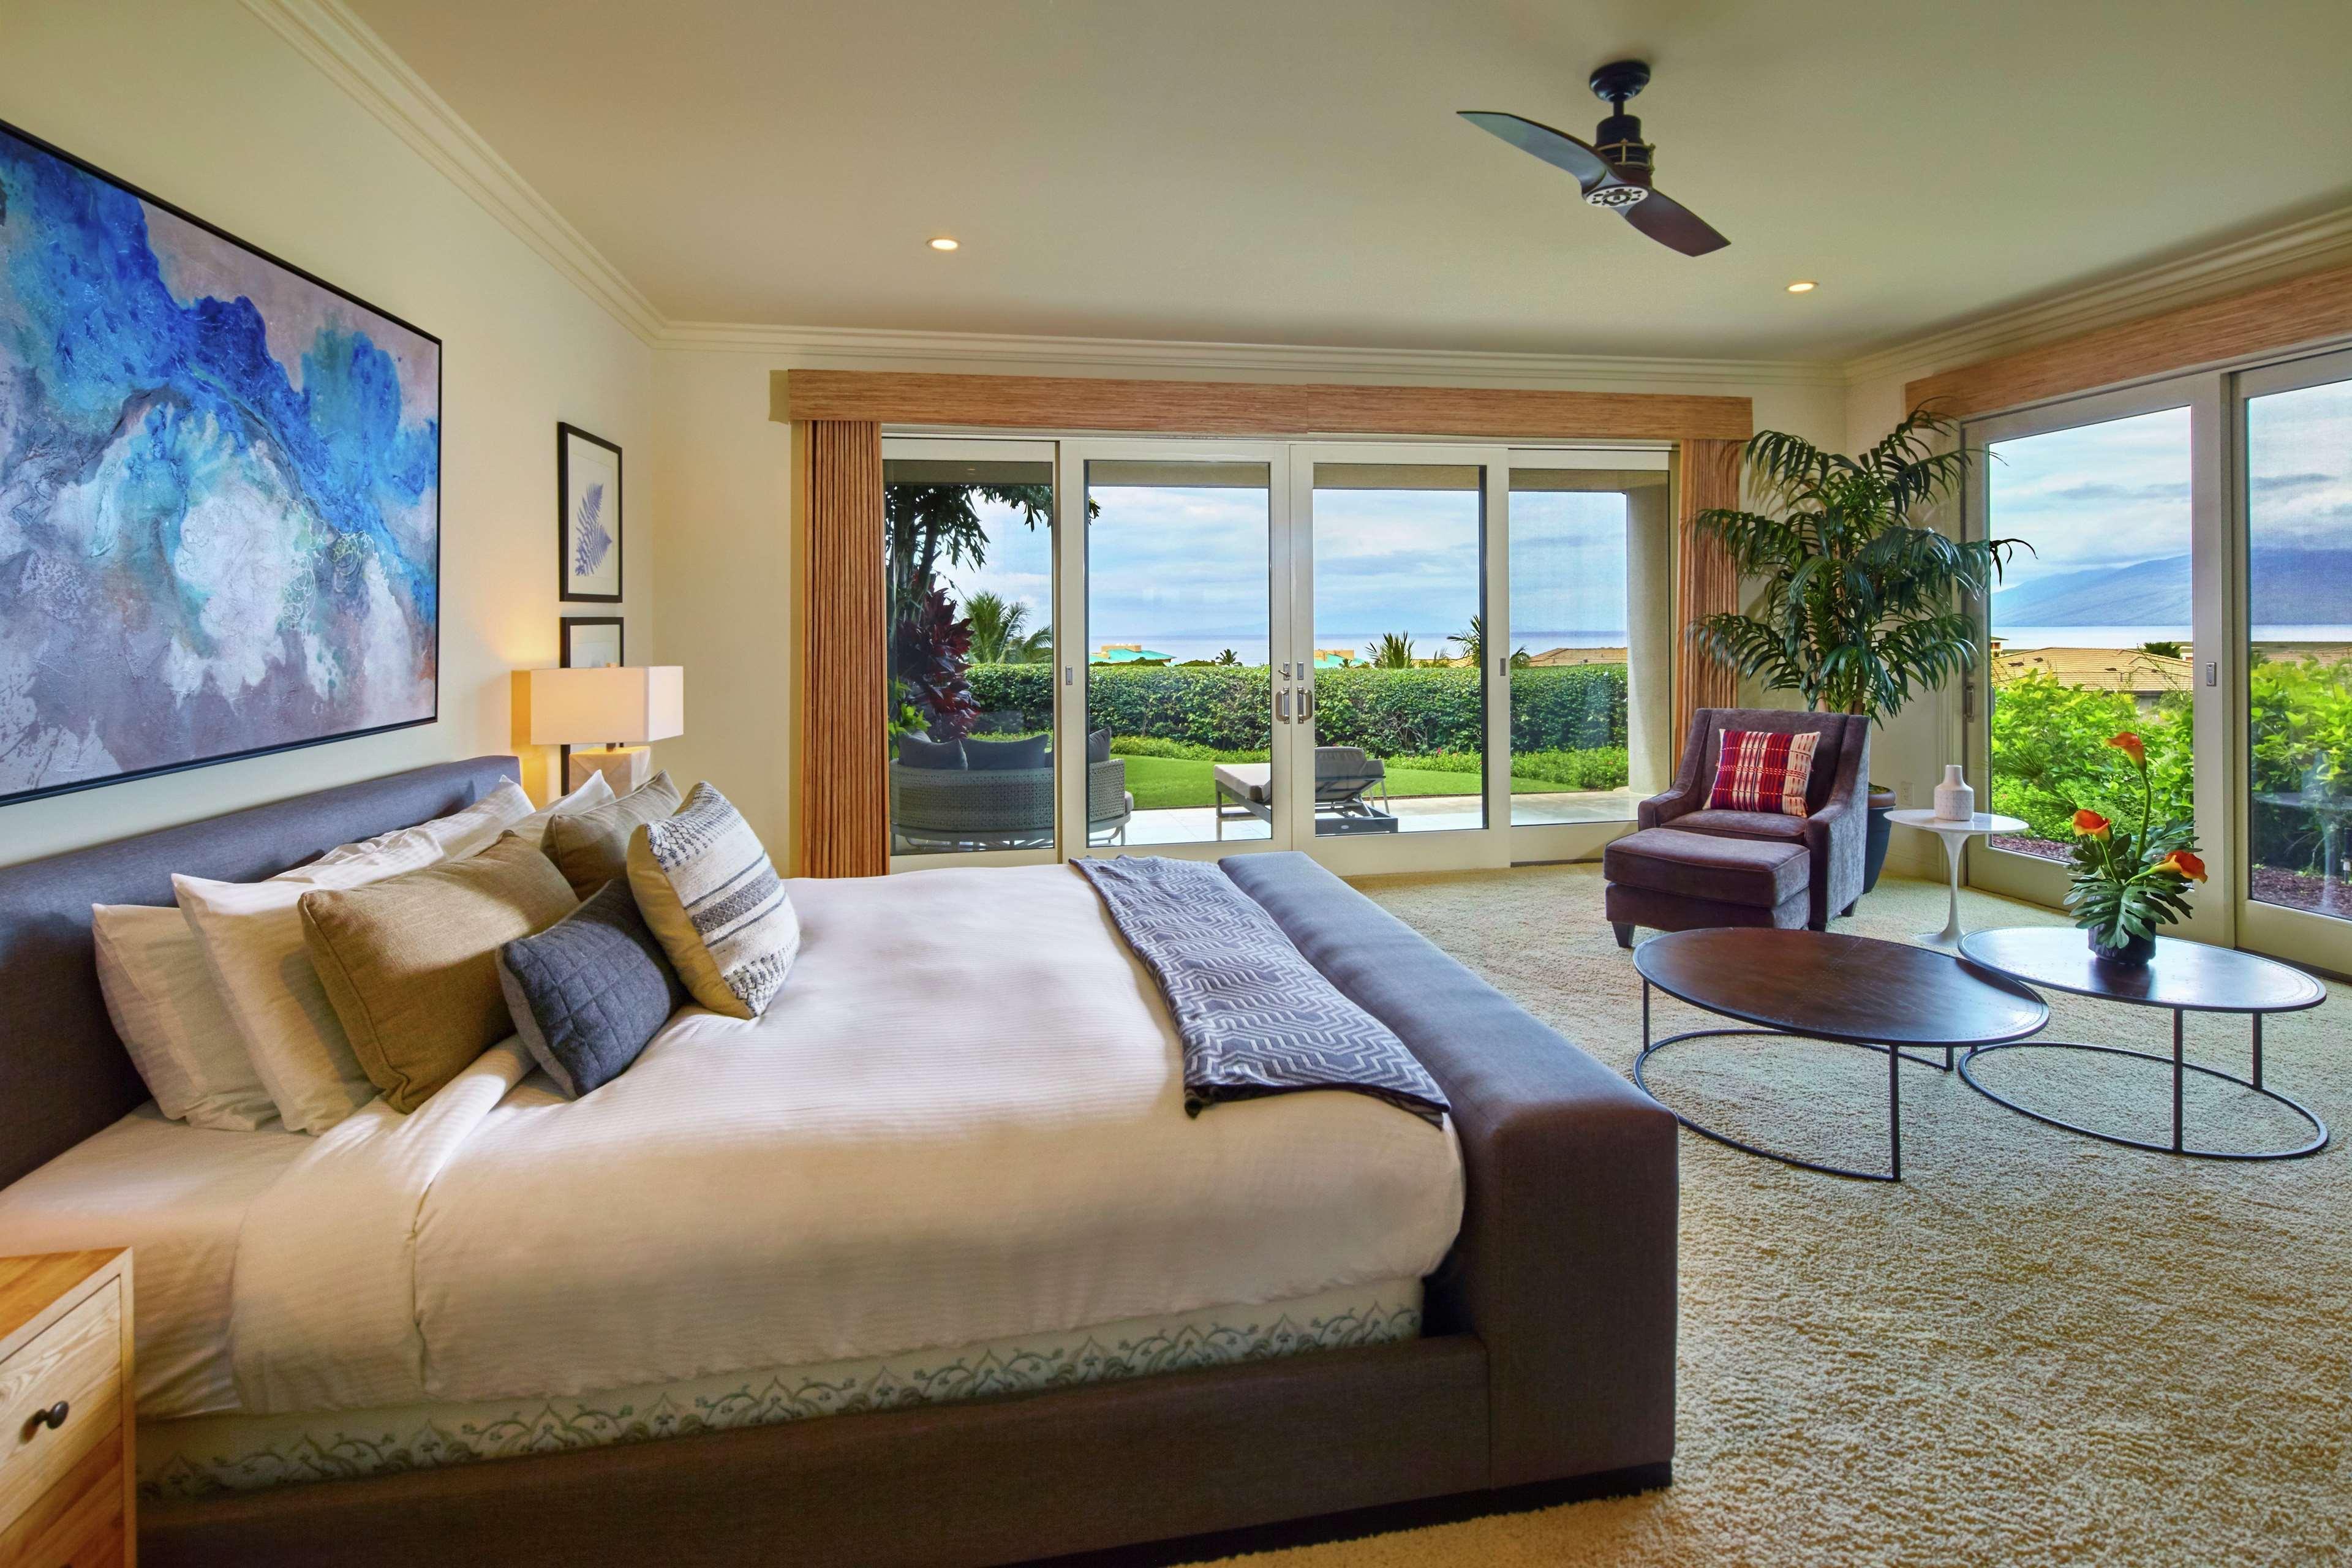 Grand Wailea Maui, A Waldorf Astoria Resort